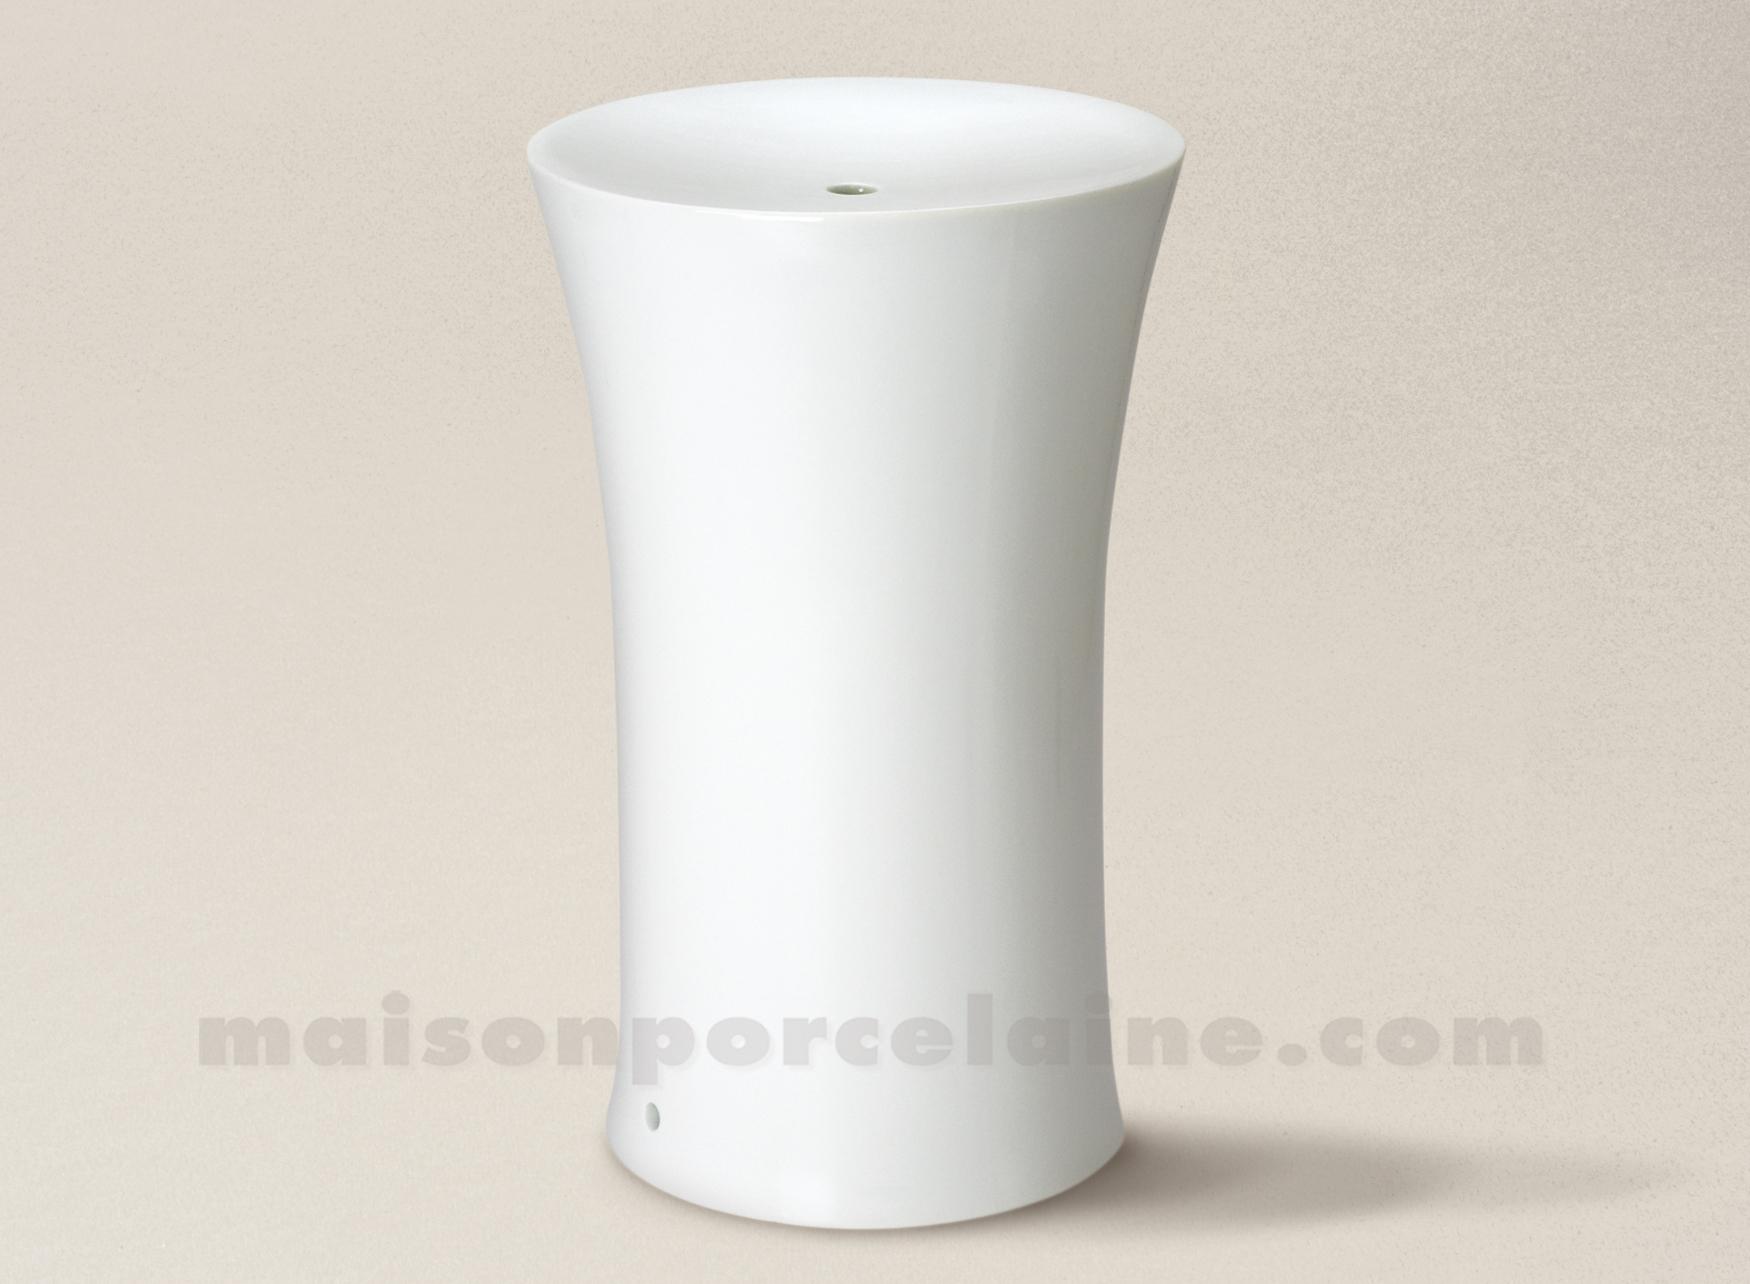 pied de lampe limoges porcelaine blanche cristal 29x18. Black Bedroom Furniture Sets. Home Design Ideas